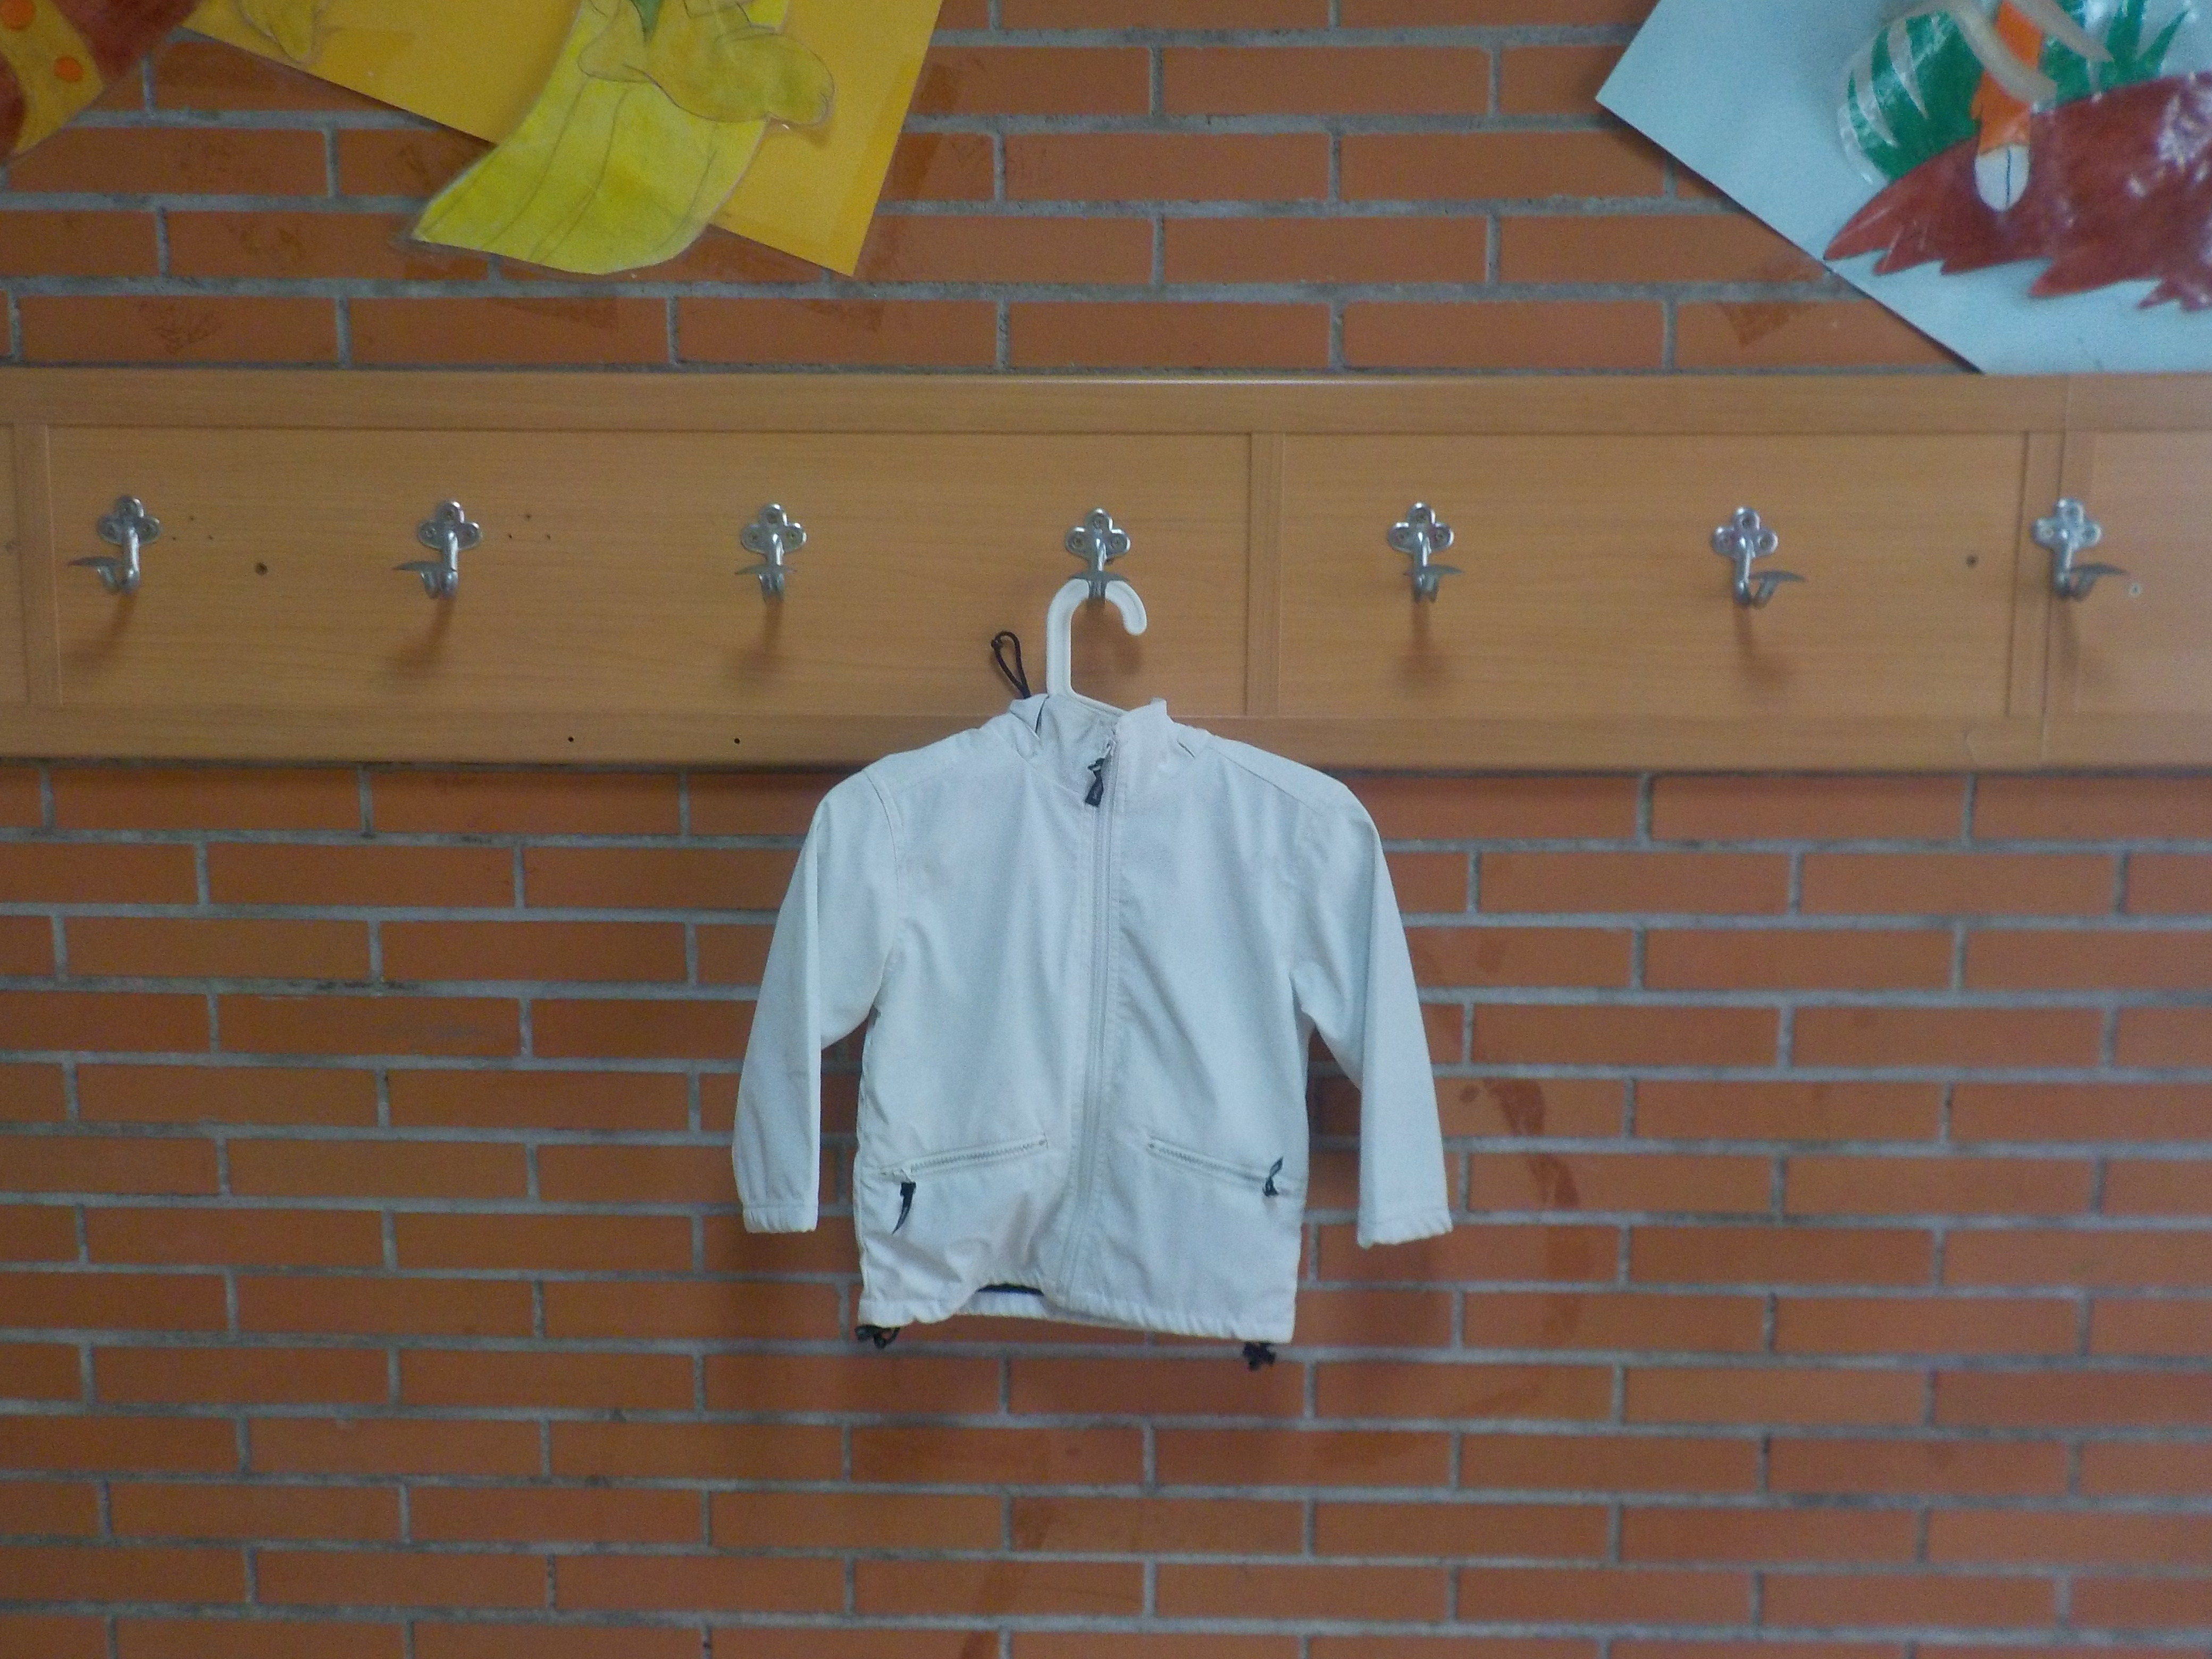 Catalogo de ropa olvidada 1  2018 17